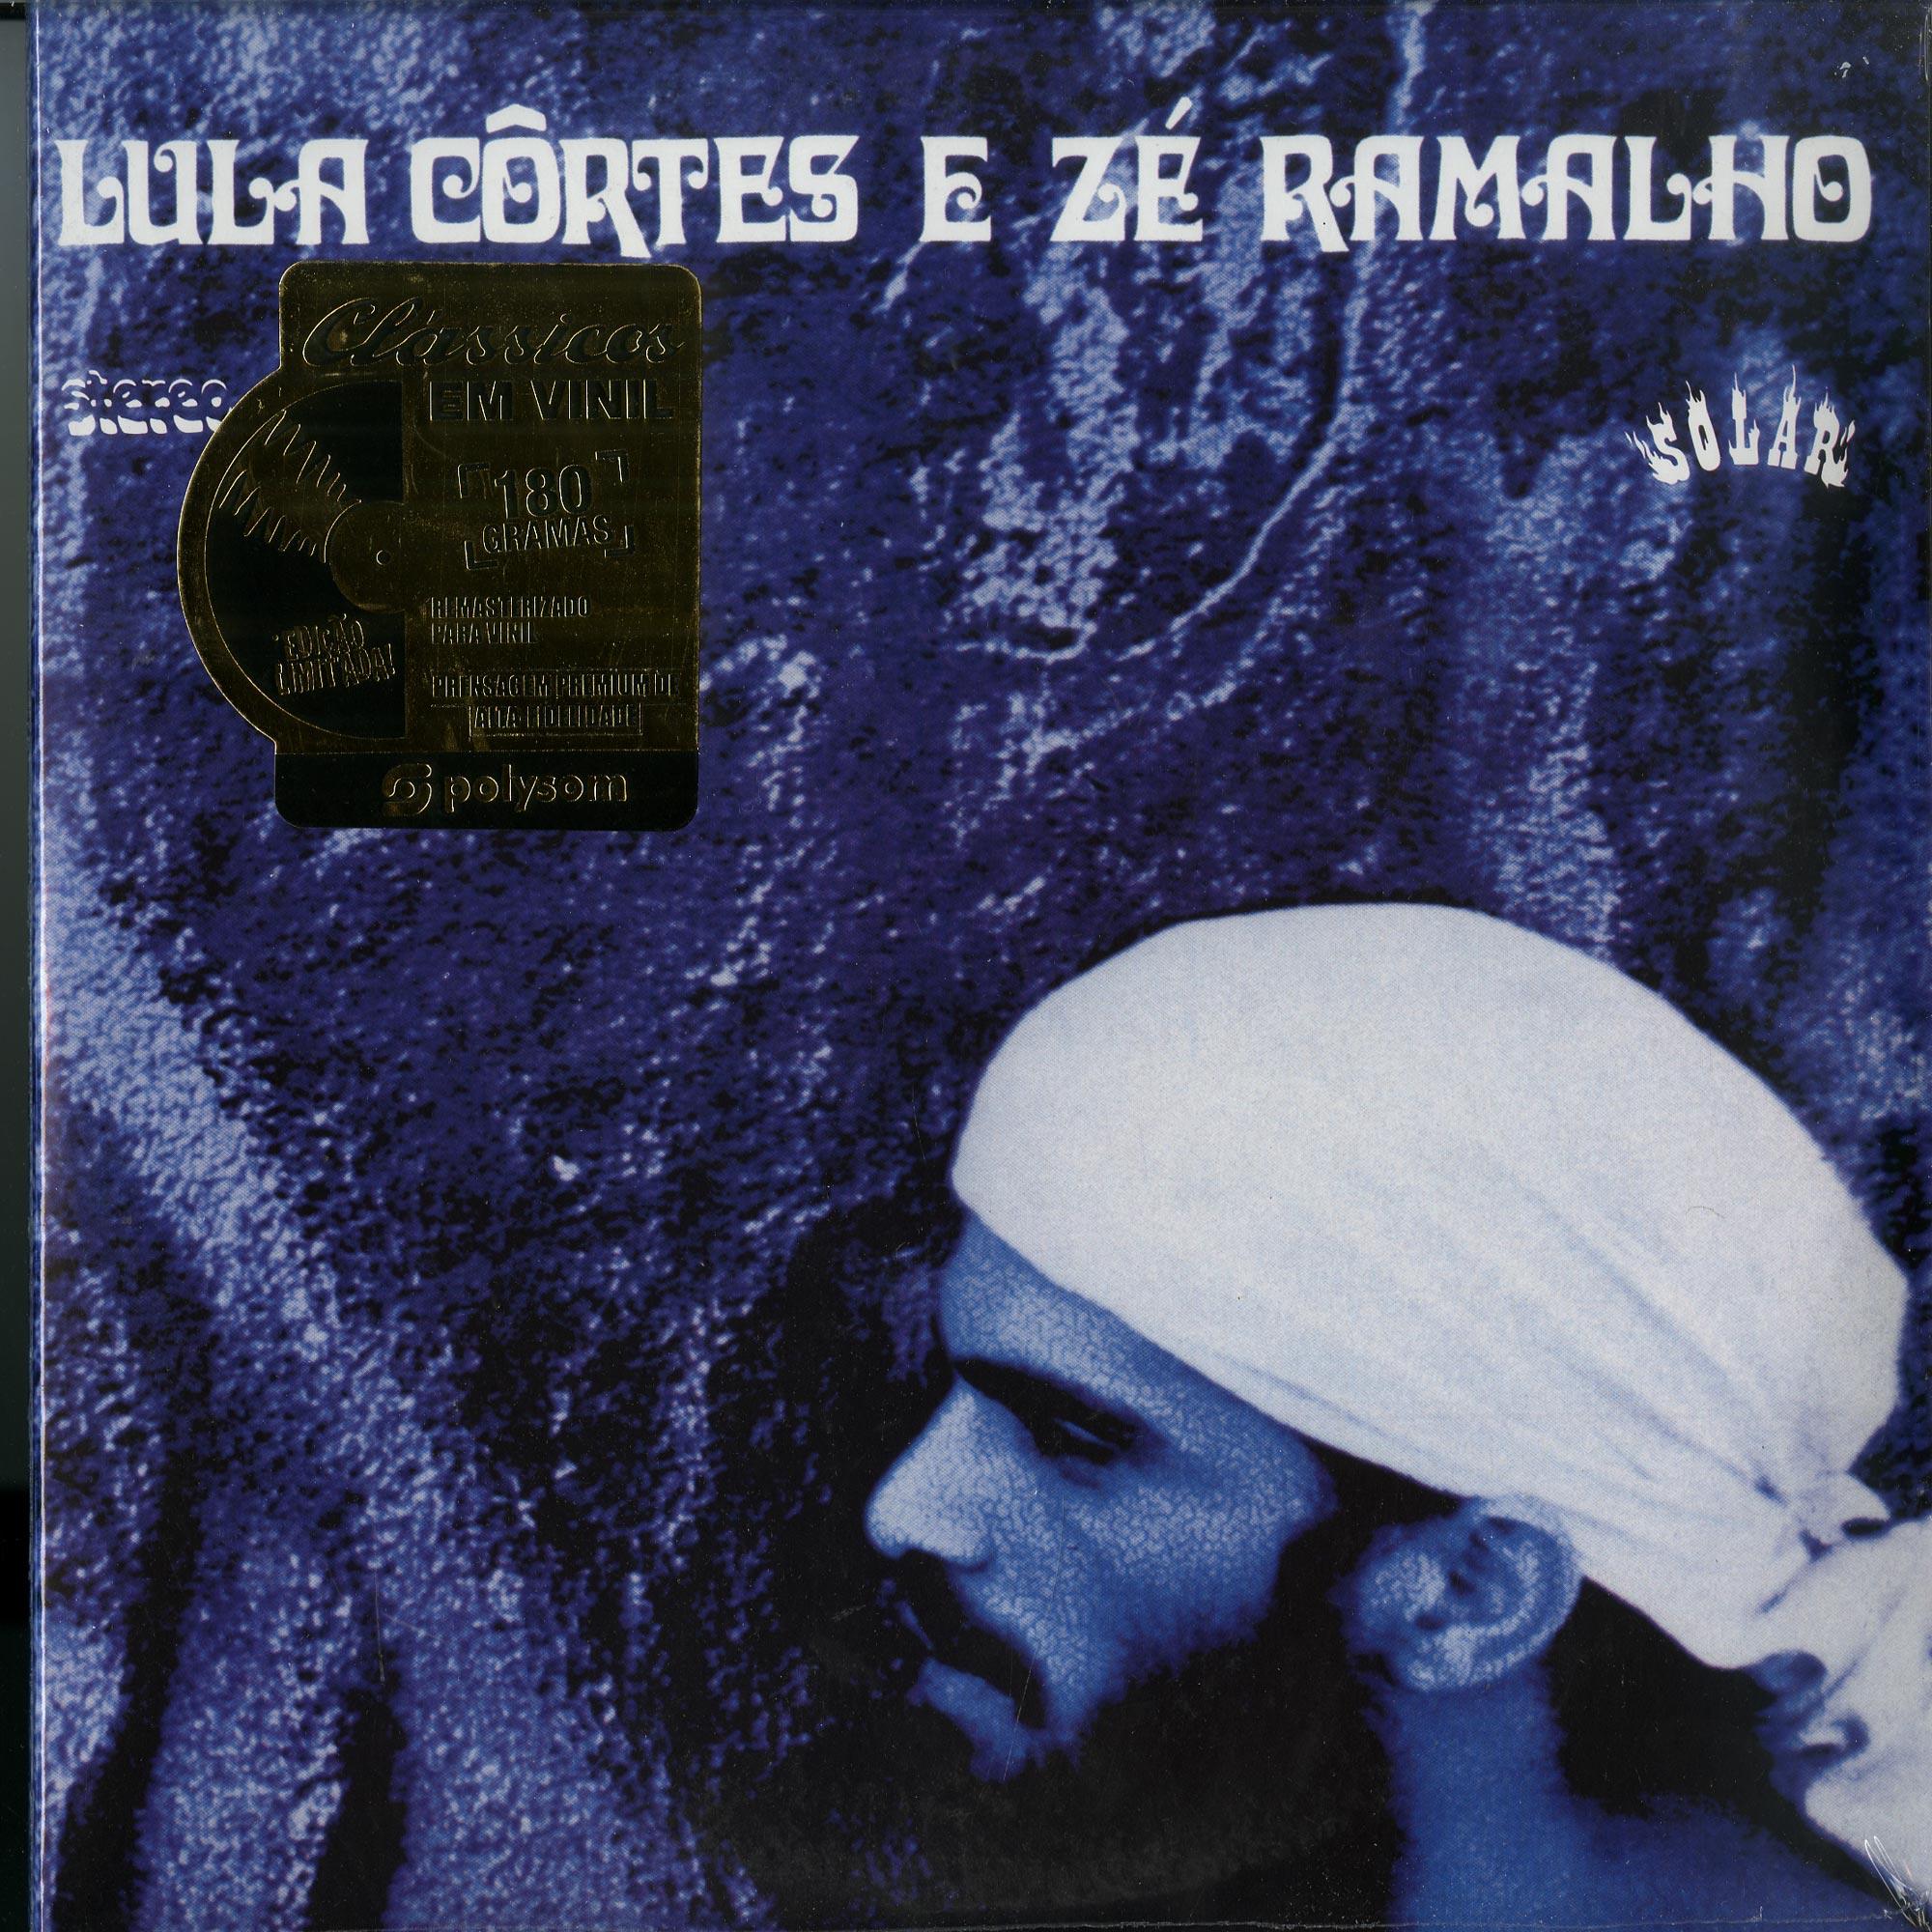 Lula Cortes & Ze Ramalho - PAEBIRU